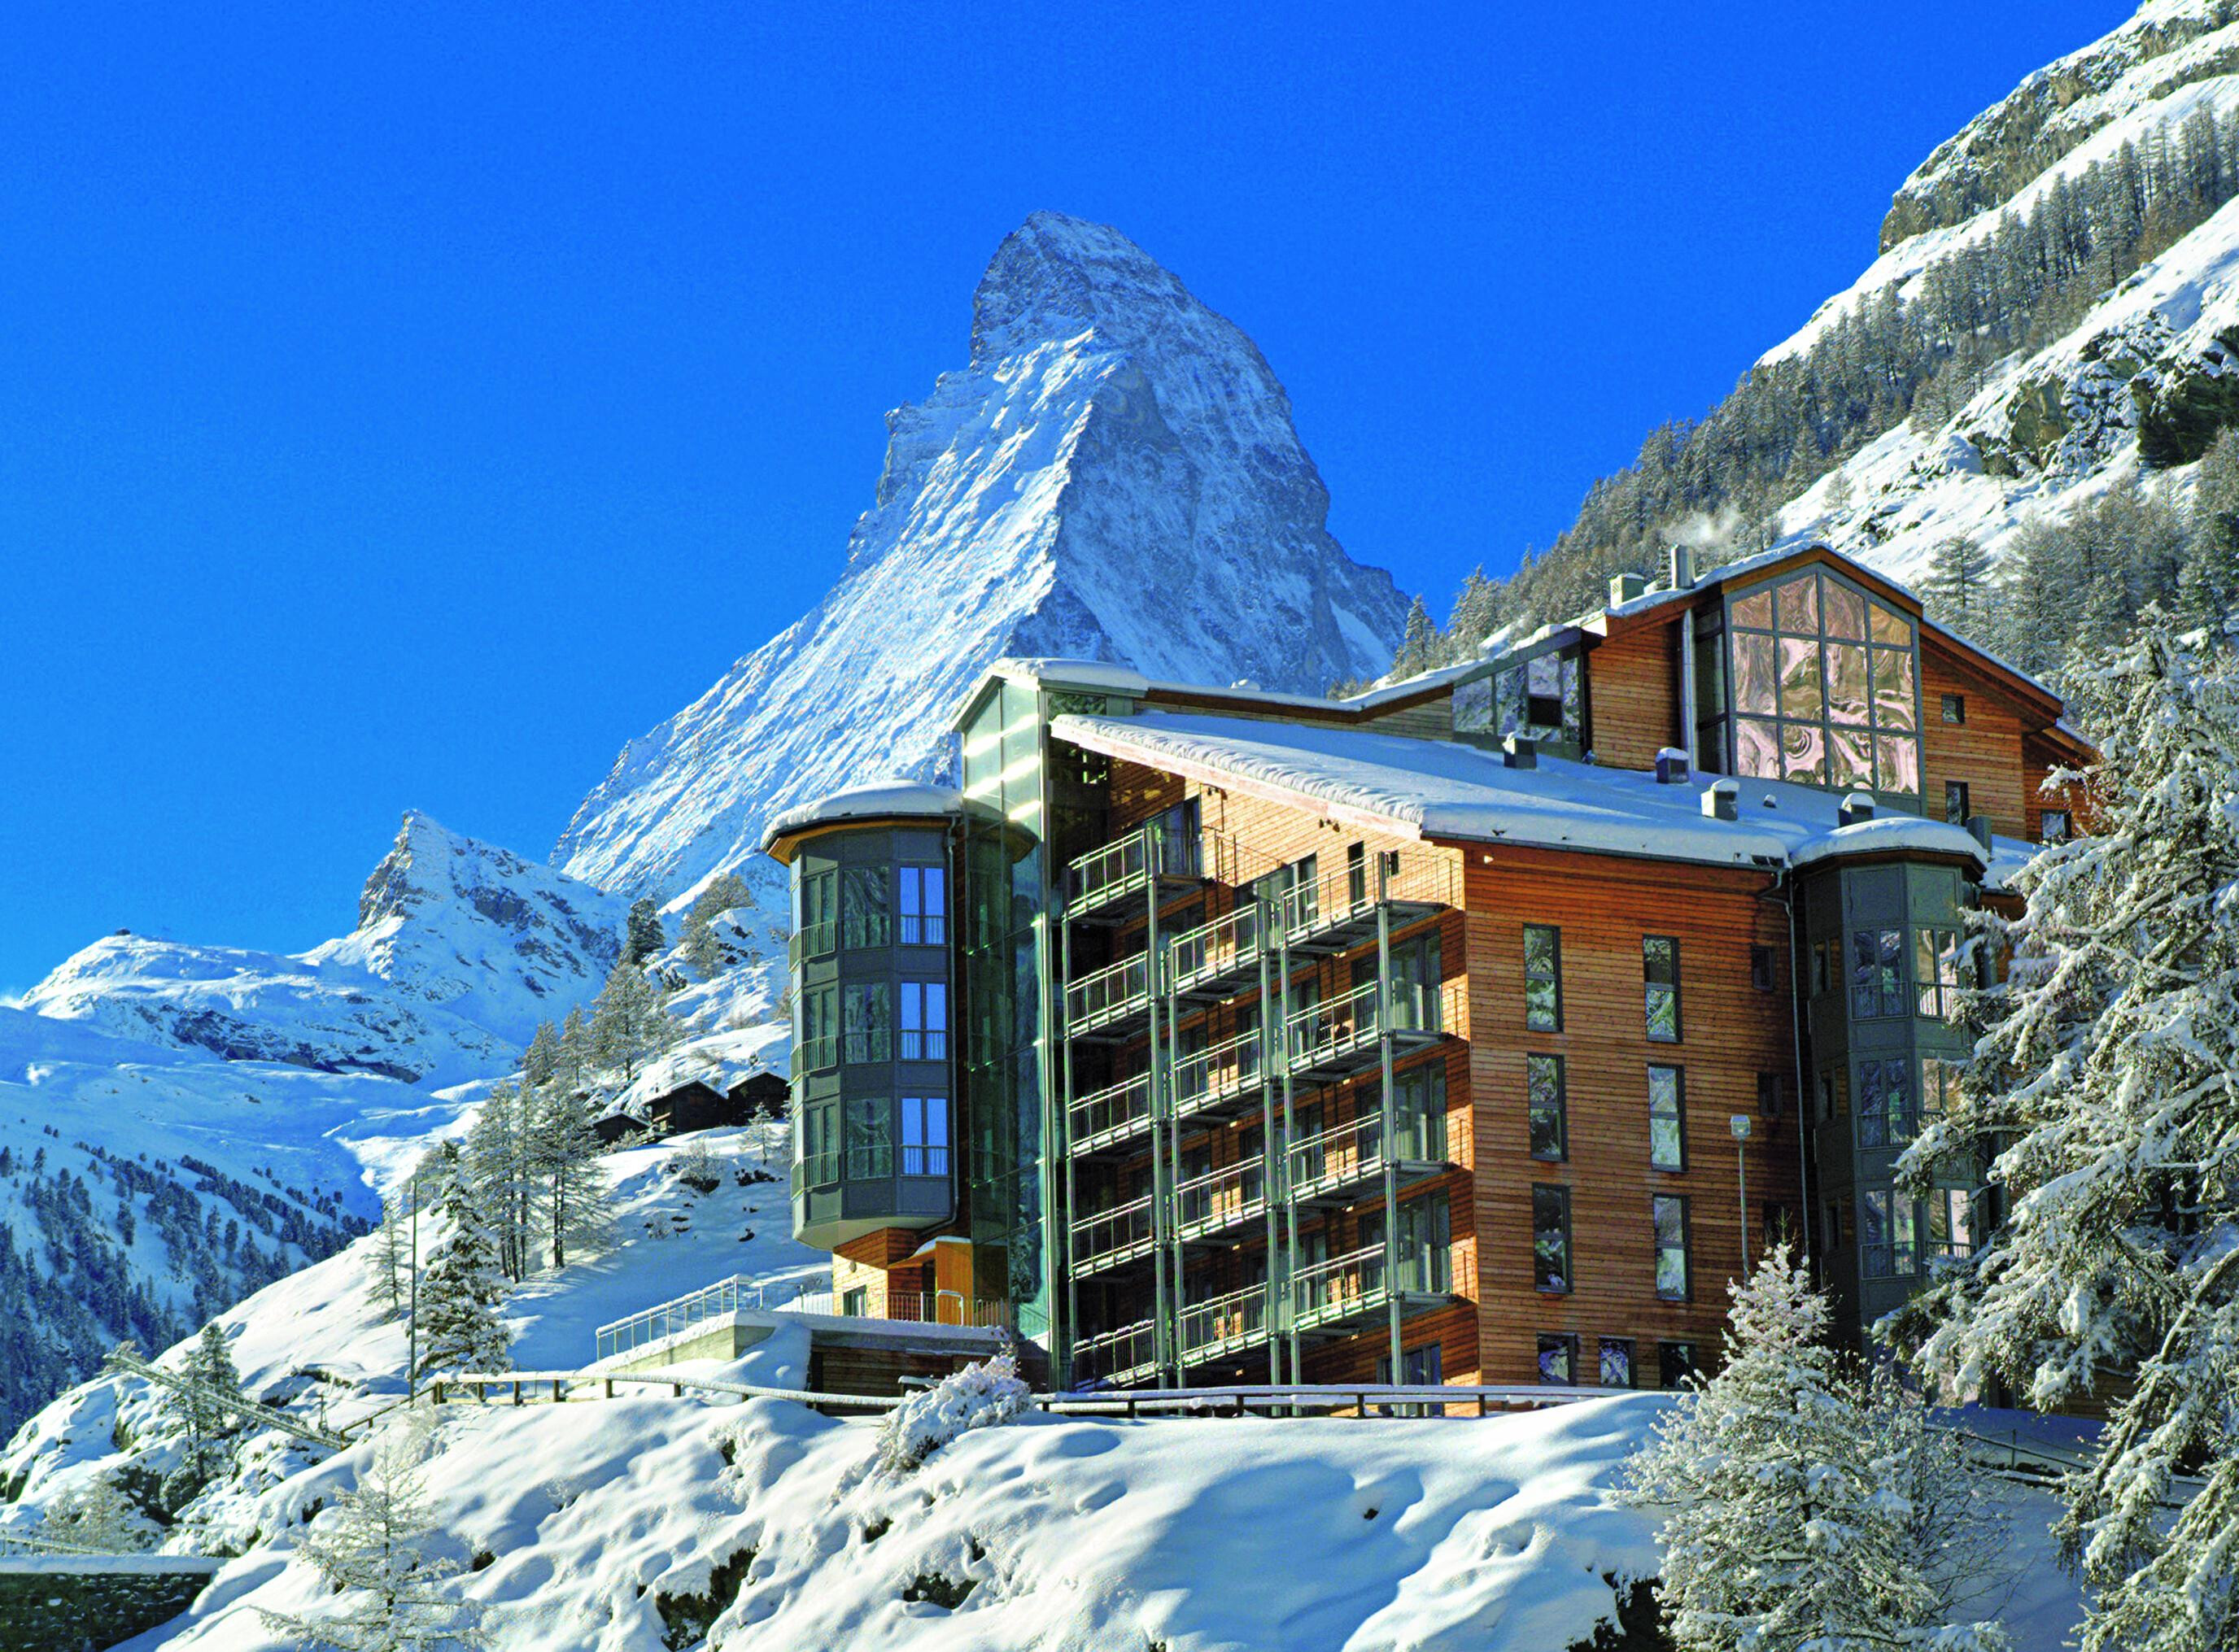 The Omnia (Zermatt, Switzerland)